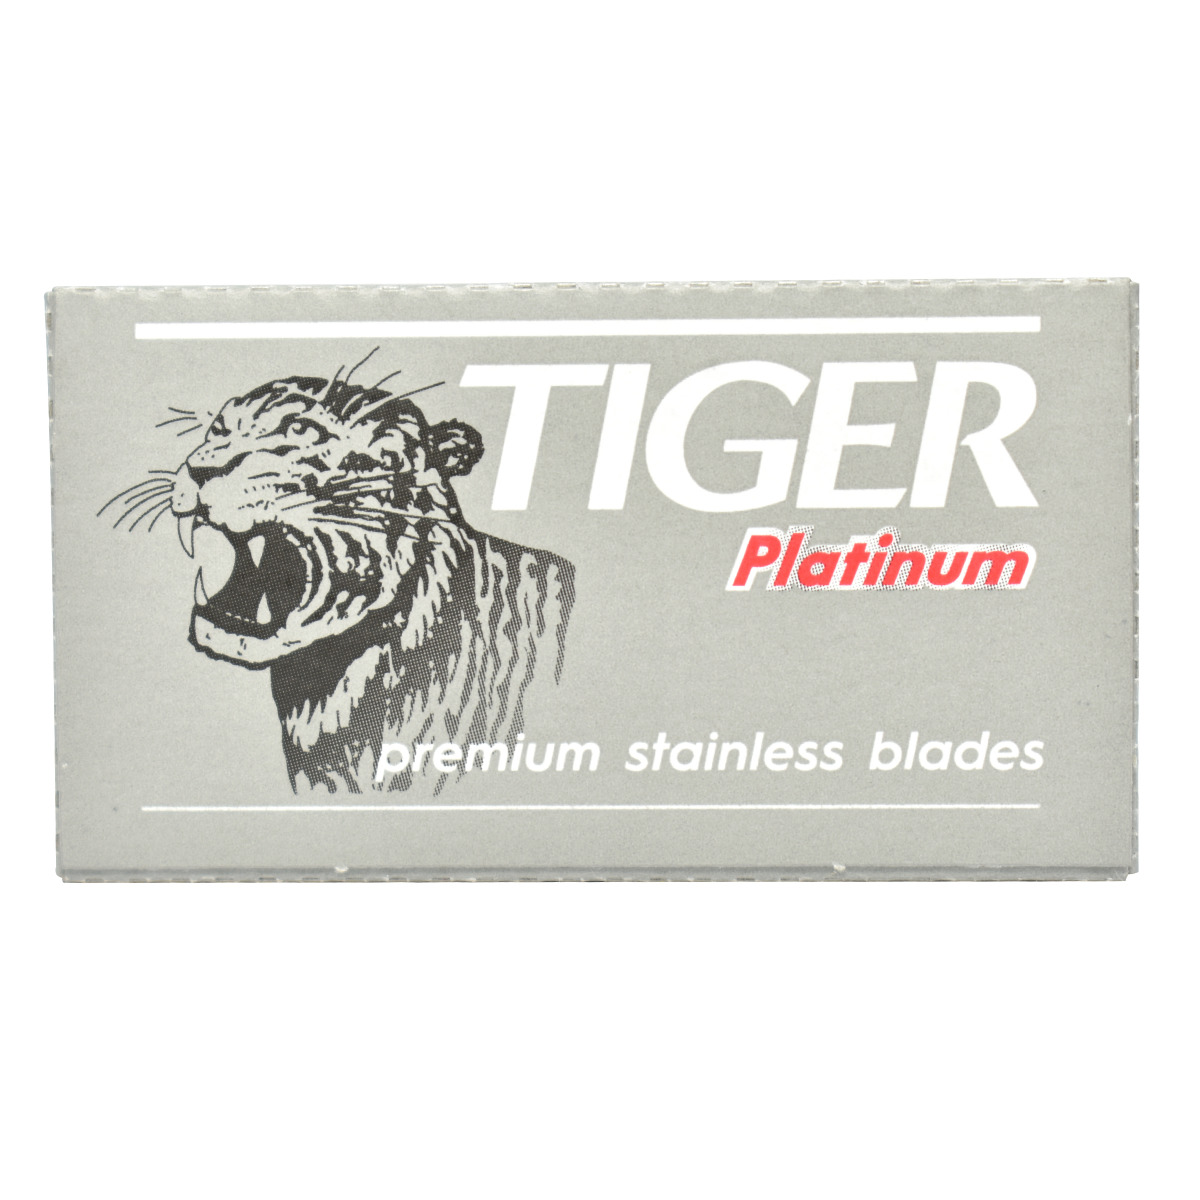 Tiger Platinum Double Edge Safety Razor Blades (x5)